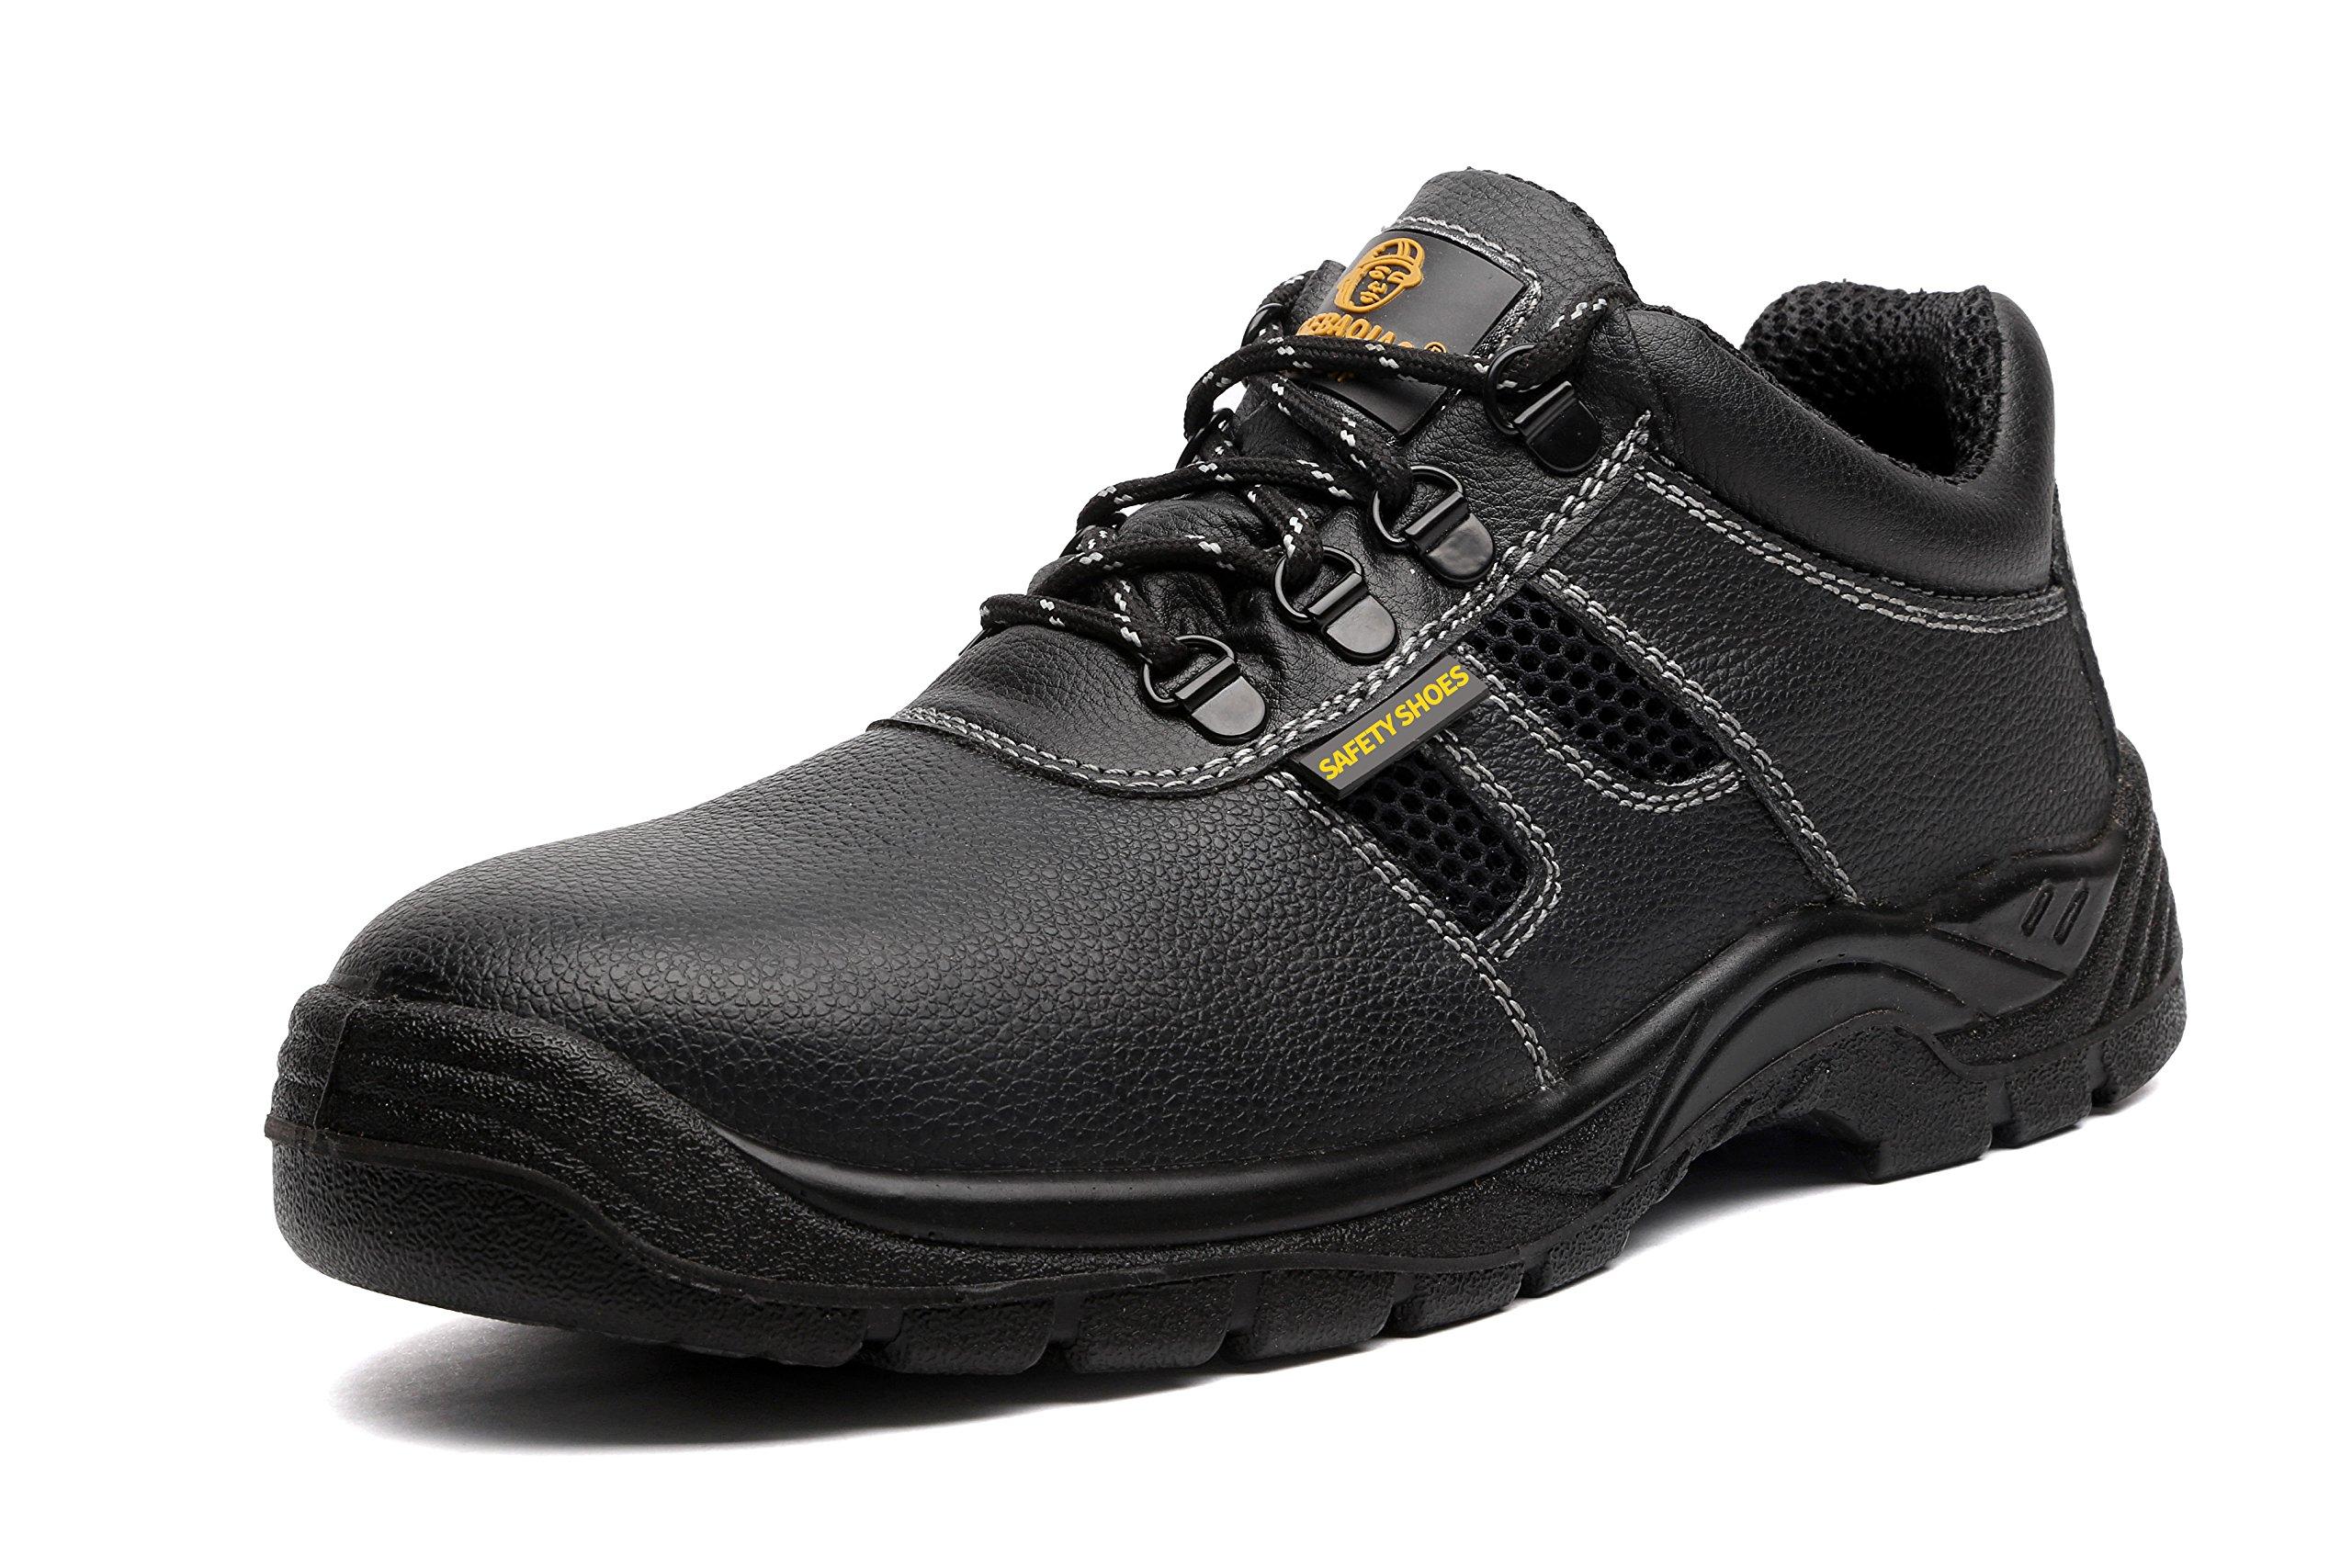 JACKBAGGIO Men's Steel Toe Steel Plate Leather Industrial Work Boot 8805 (9.5) by JACKBAGGIO